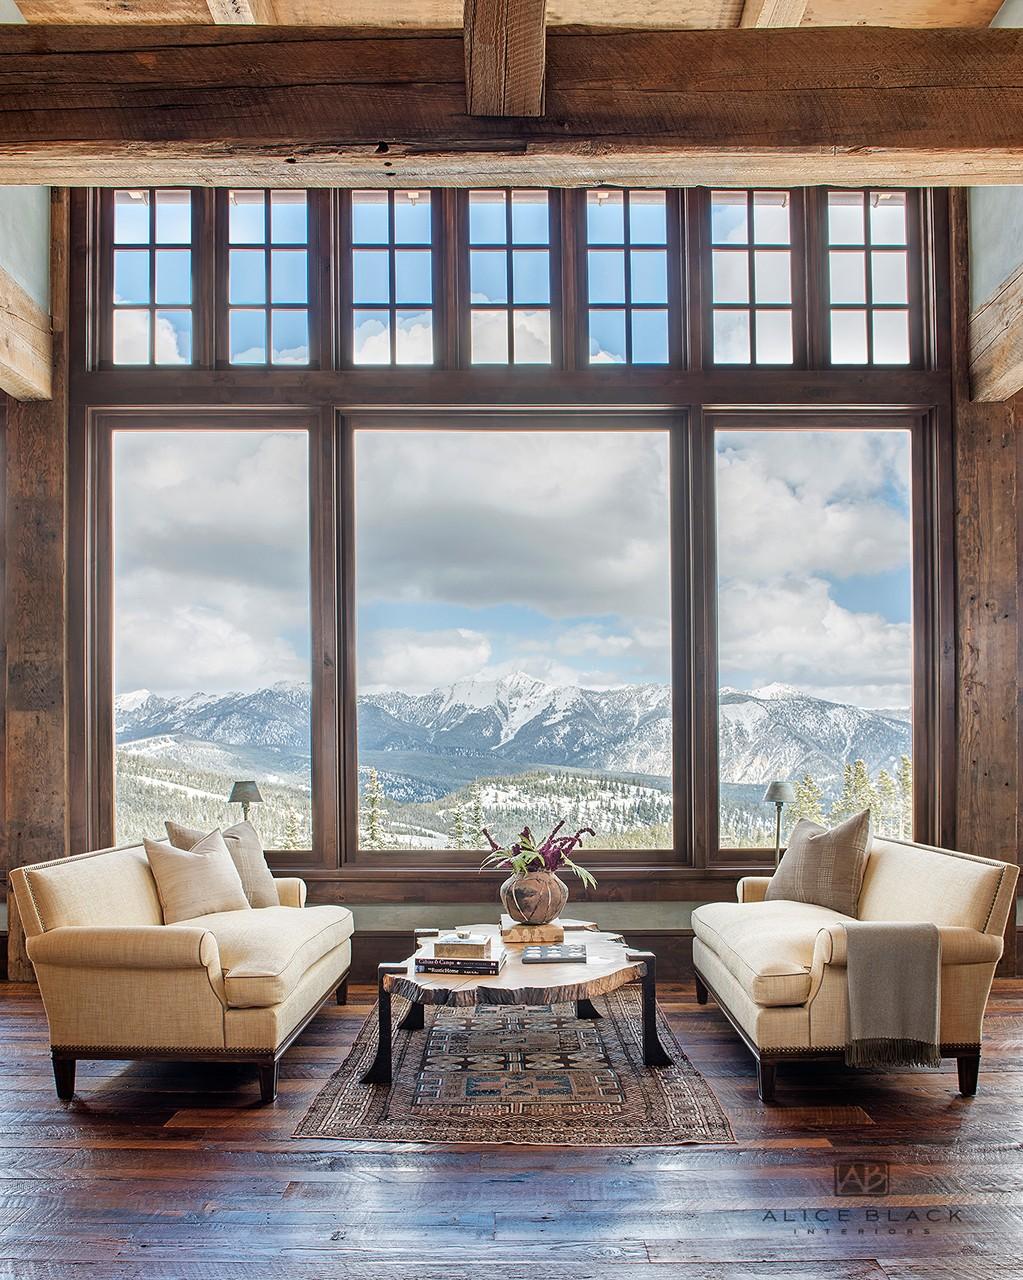 Yellowstone Interior Designer Alice Black